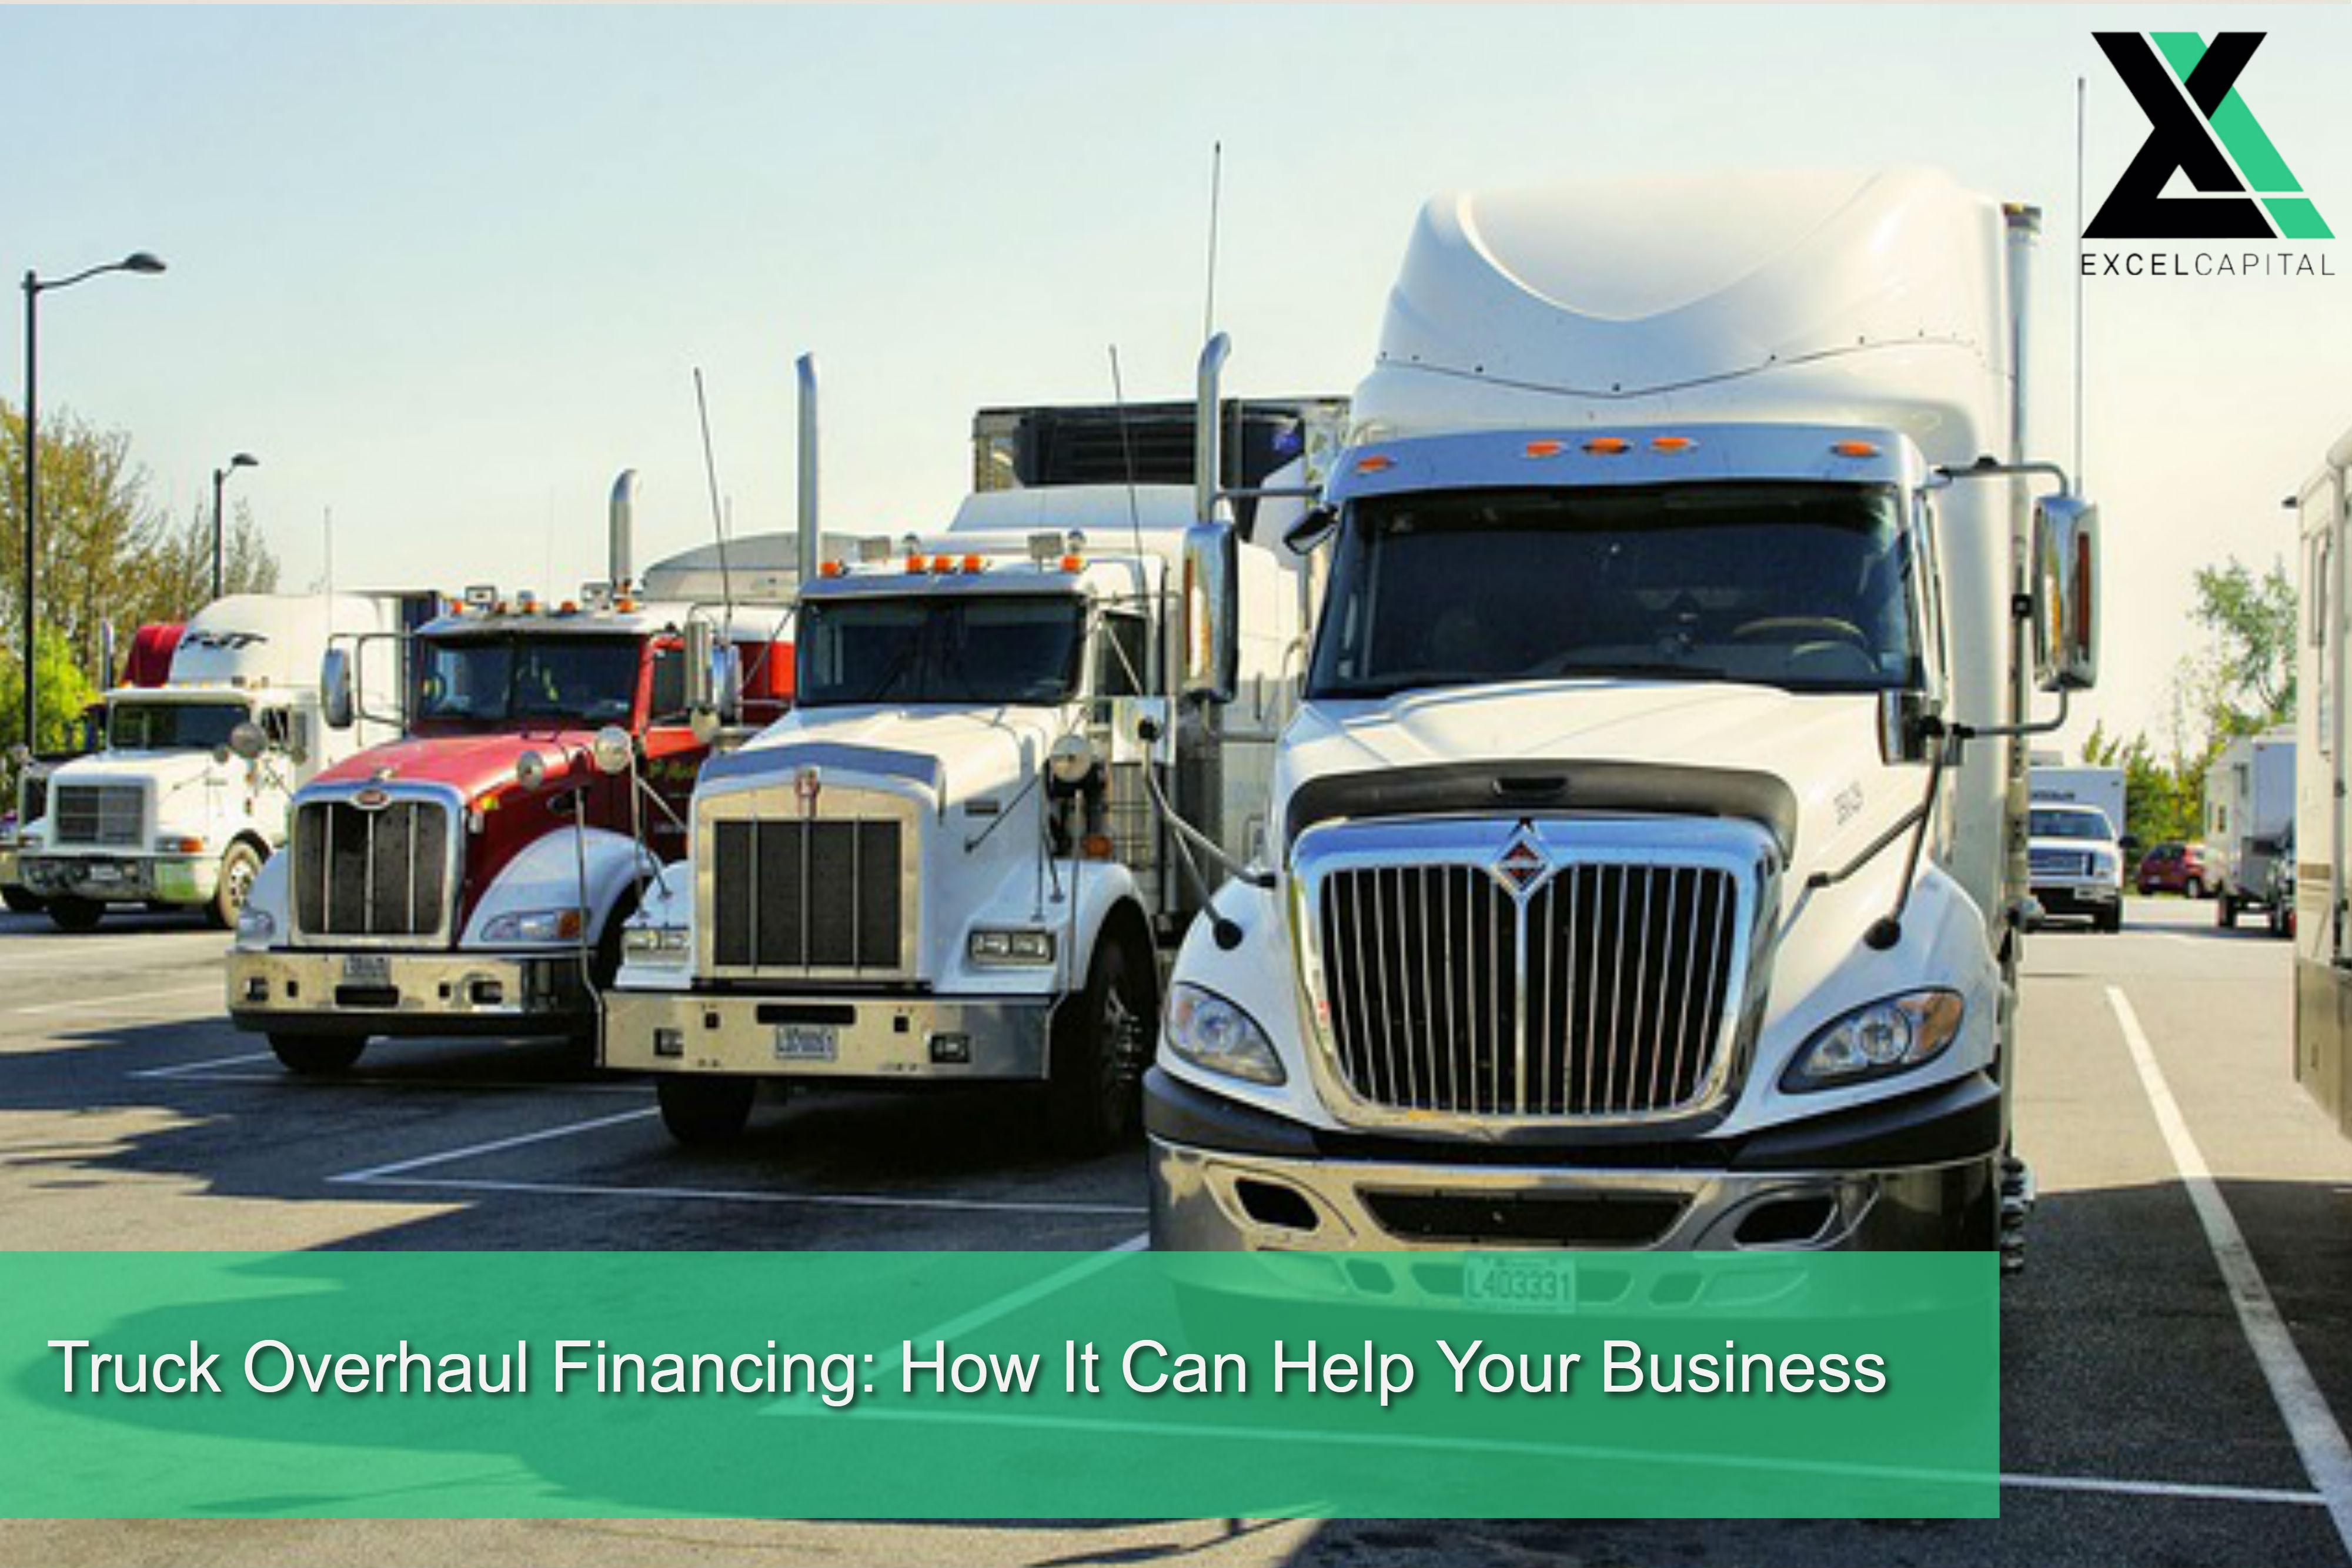 Truck Overhaul Financing: How It Can Help Your Business